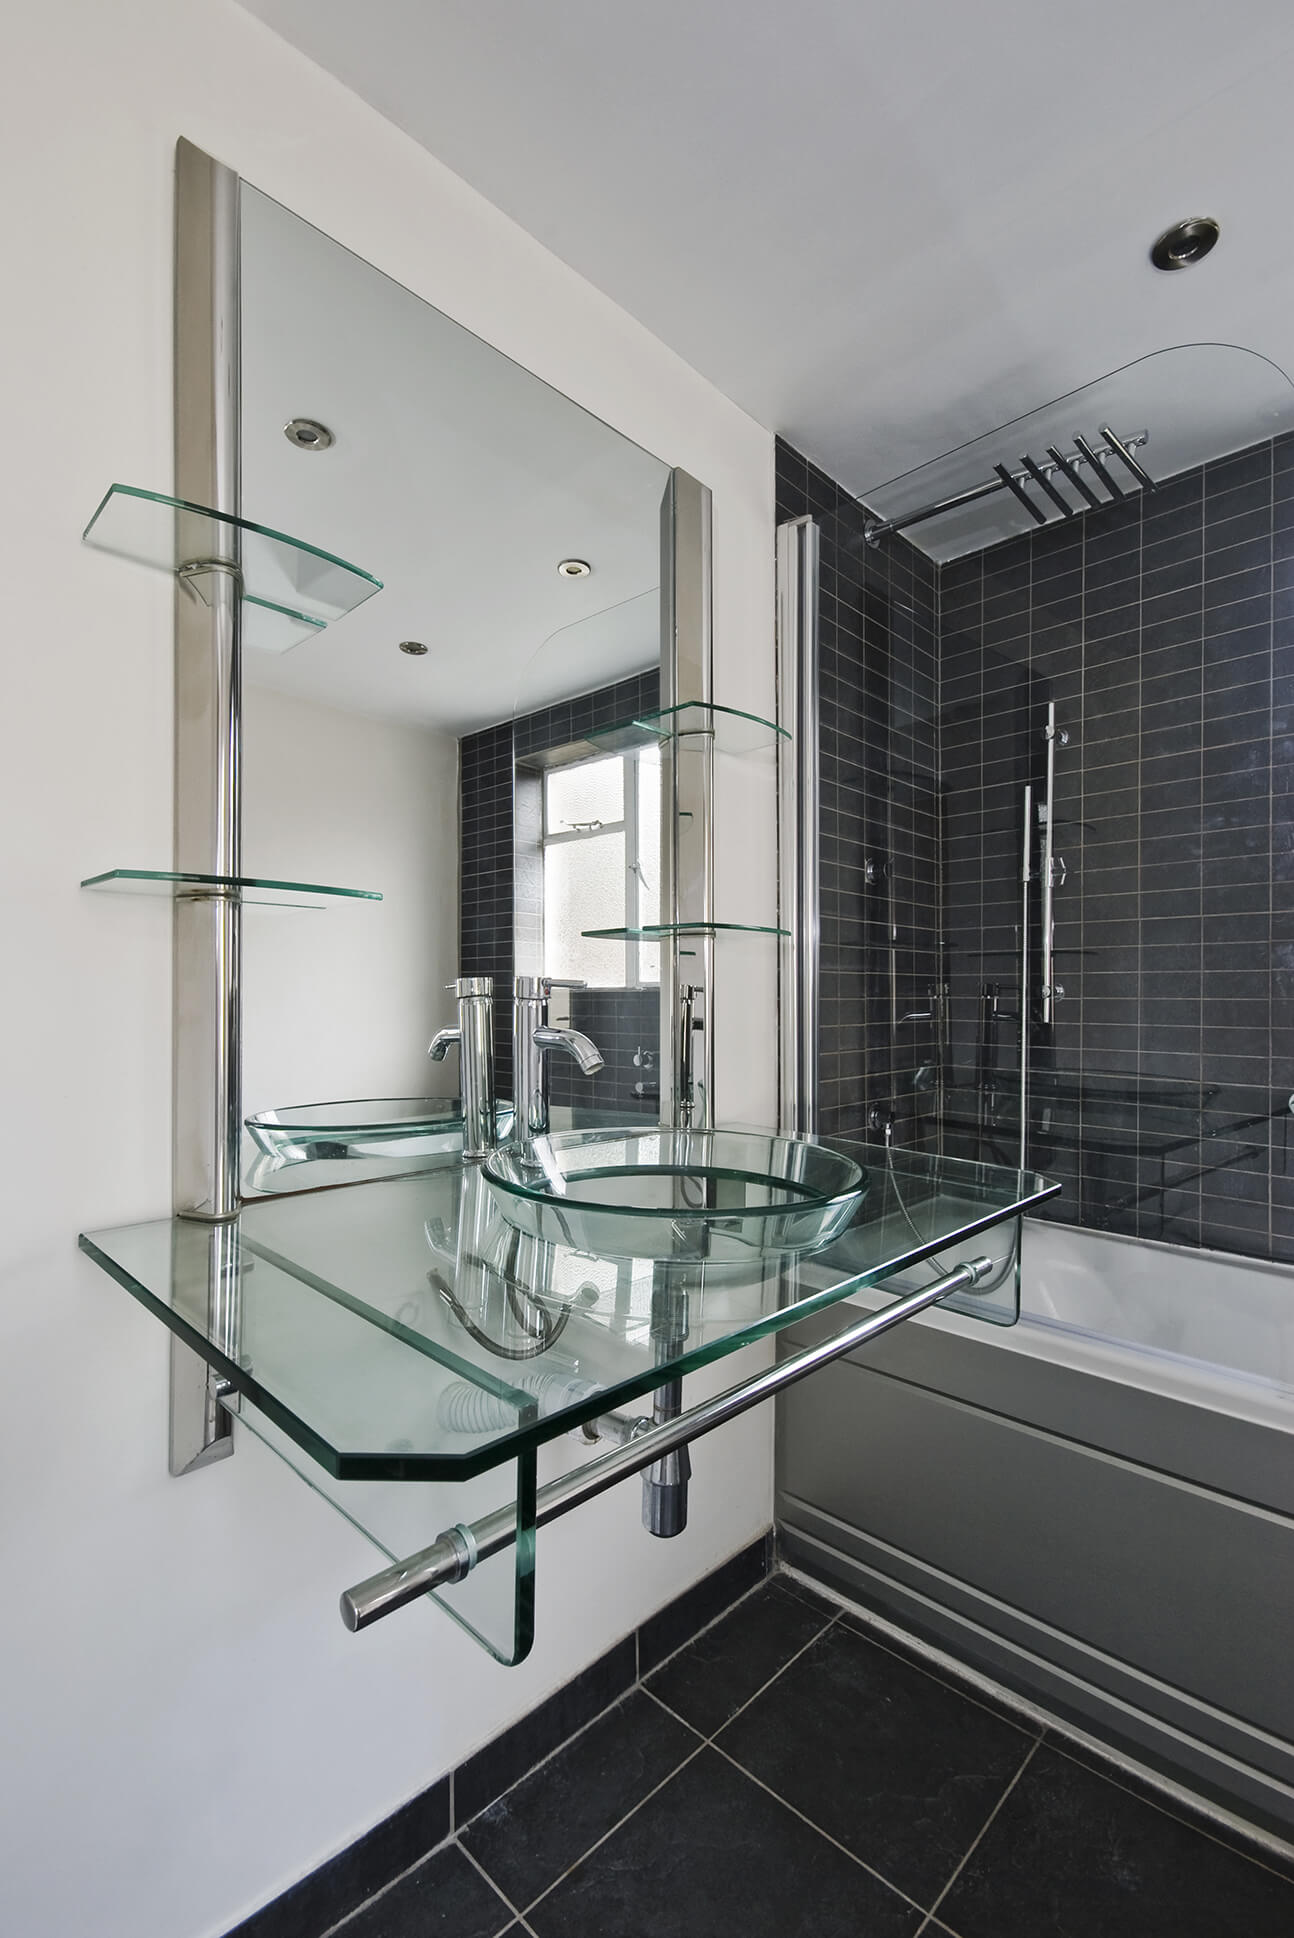 10 Creative Wall Glass Shelves Installing Ideas